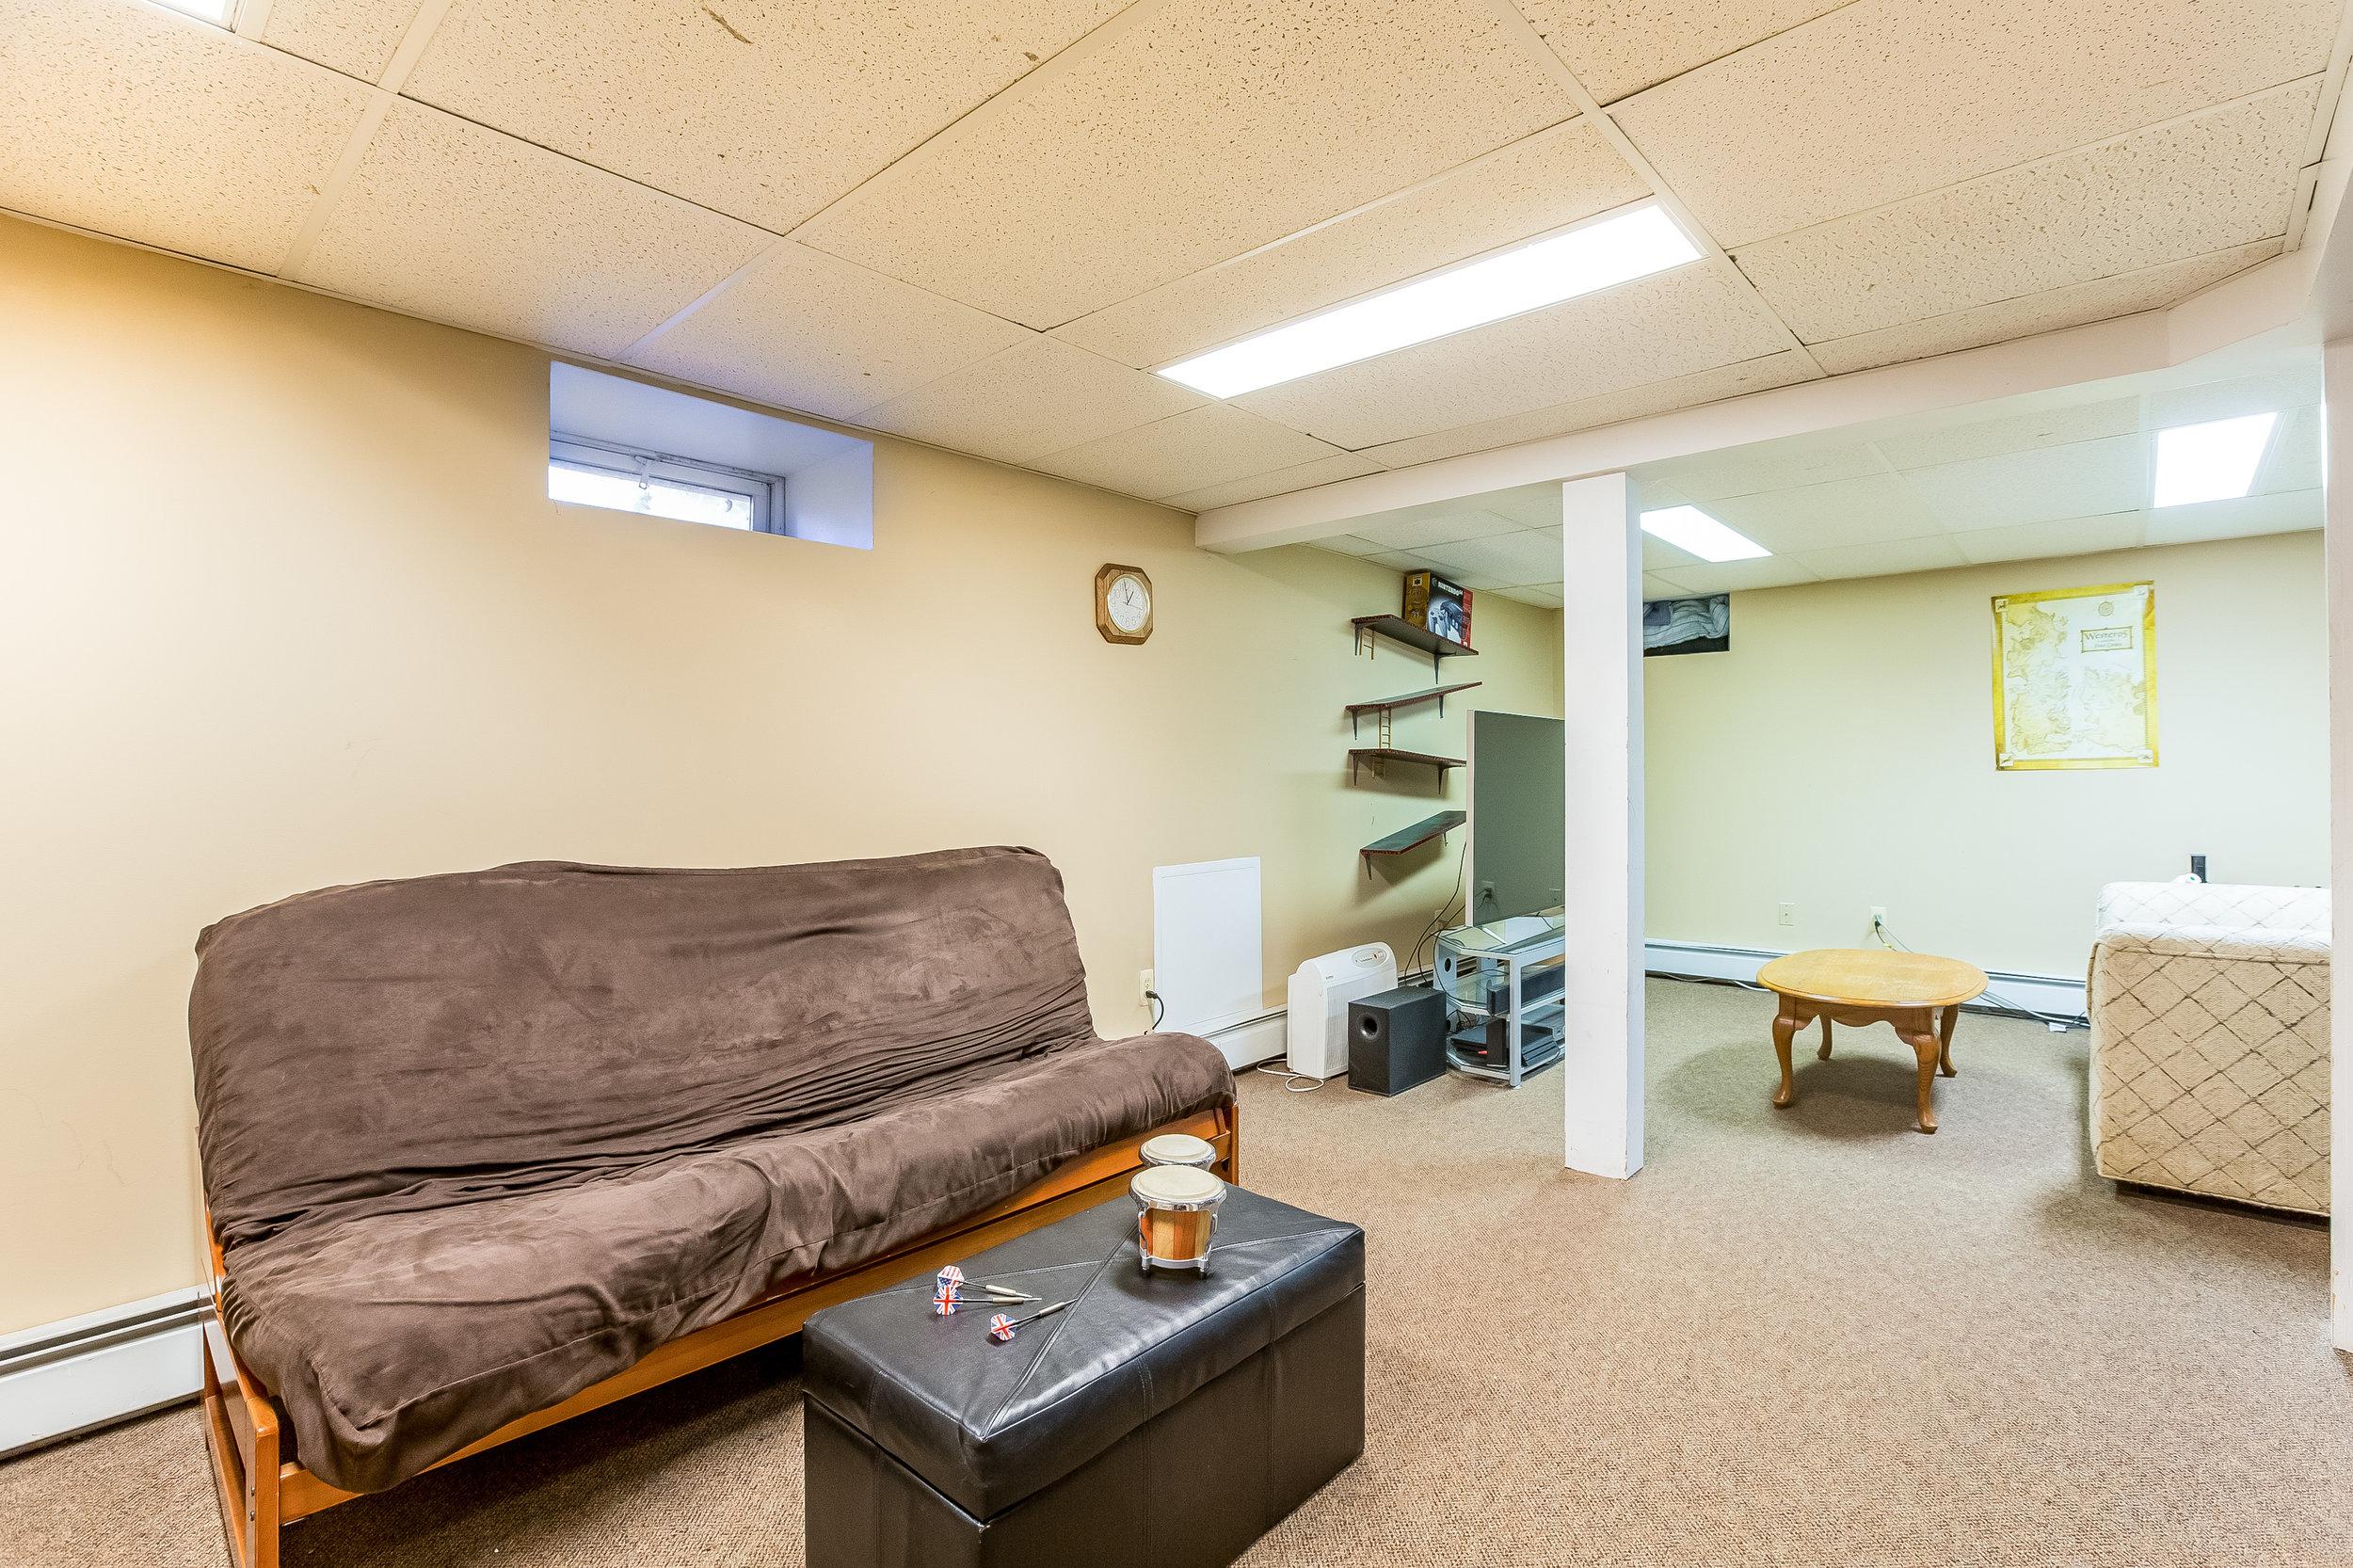 040-Recreation_Room-5002174-large.jpg